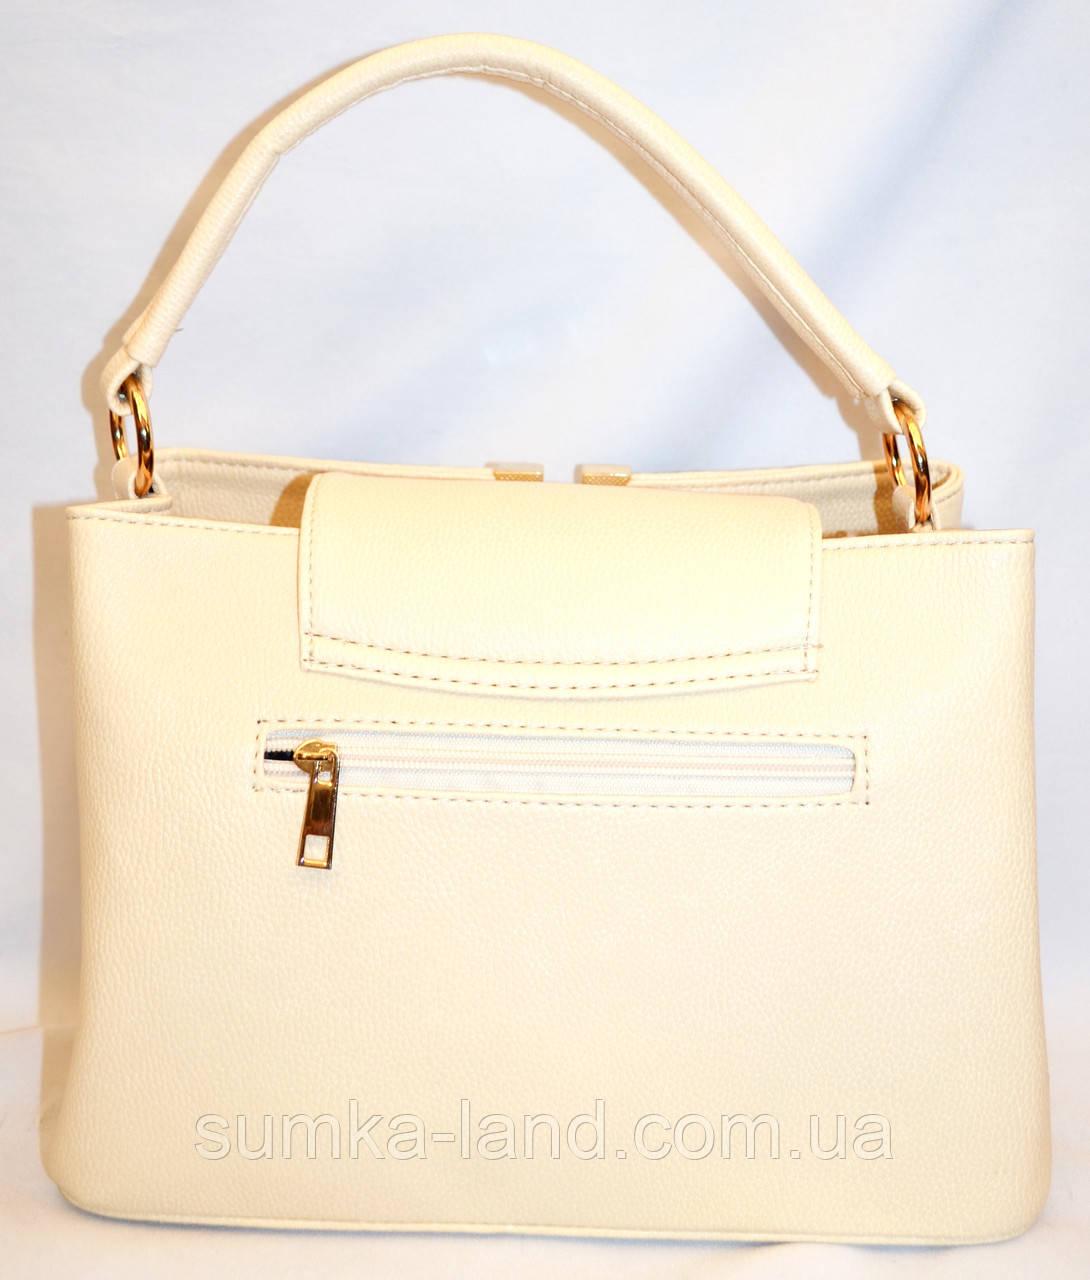 e4614df1c871 Женские БРЕНДОВЫЕ сумки и саквояжи Louis Vuitton (БРОНЗА): продажа ...